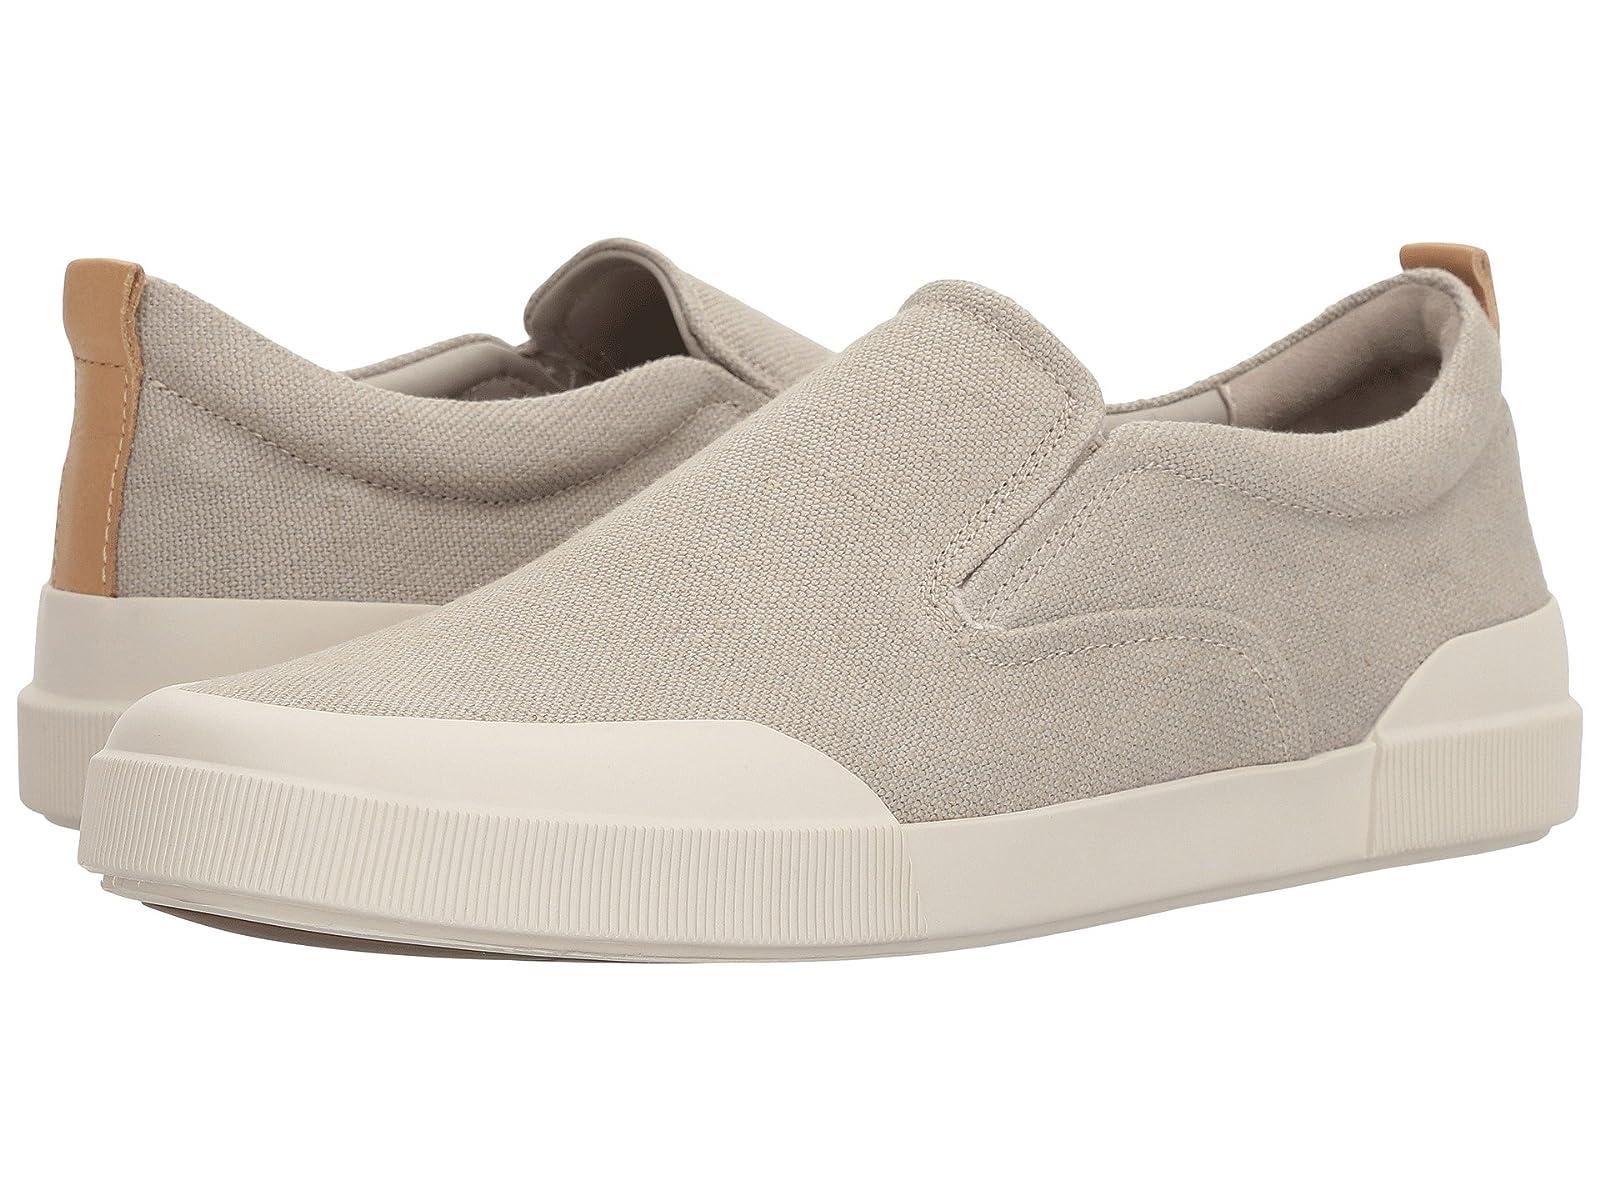 Vince VernonAtmospheric grades have affordable shoes